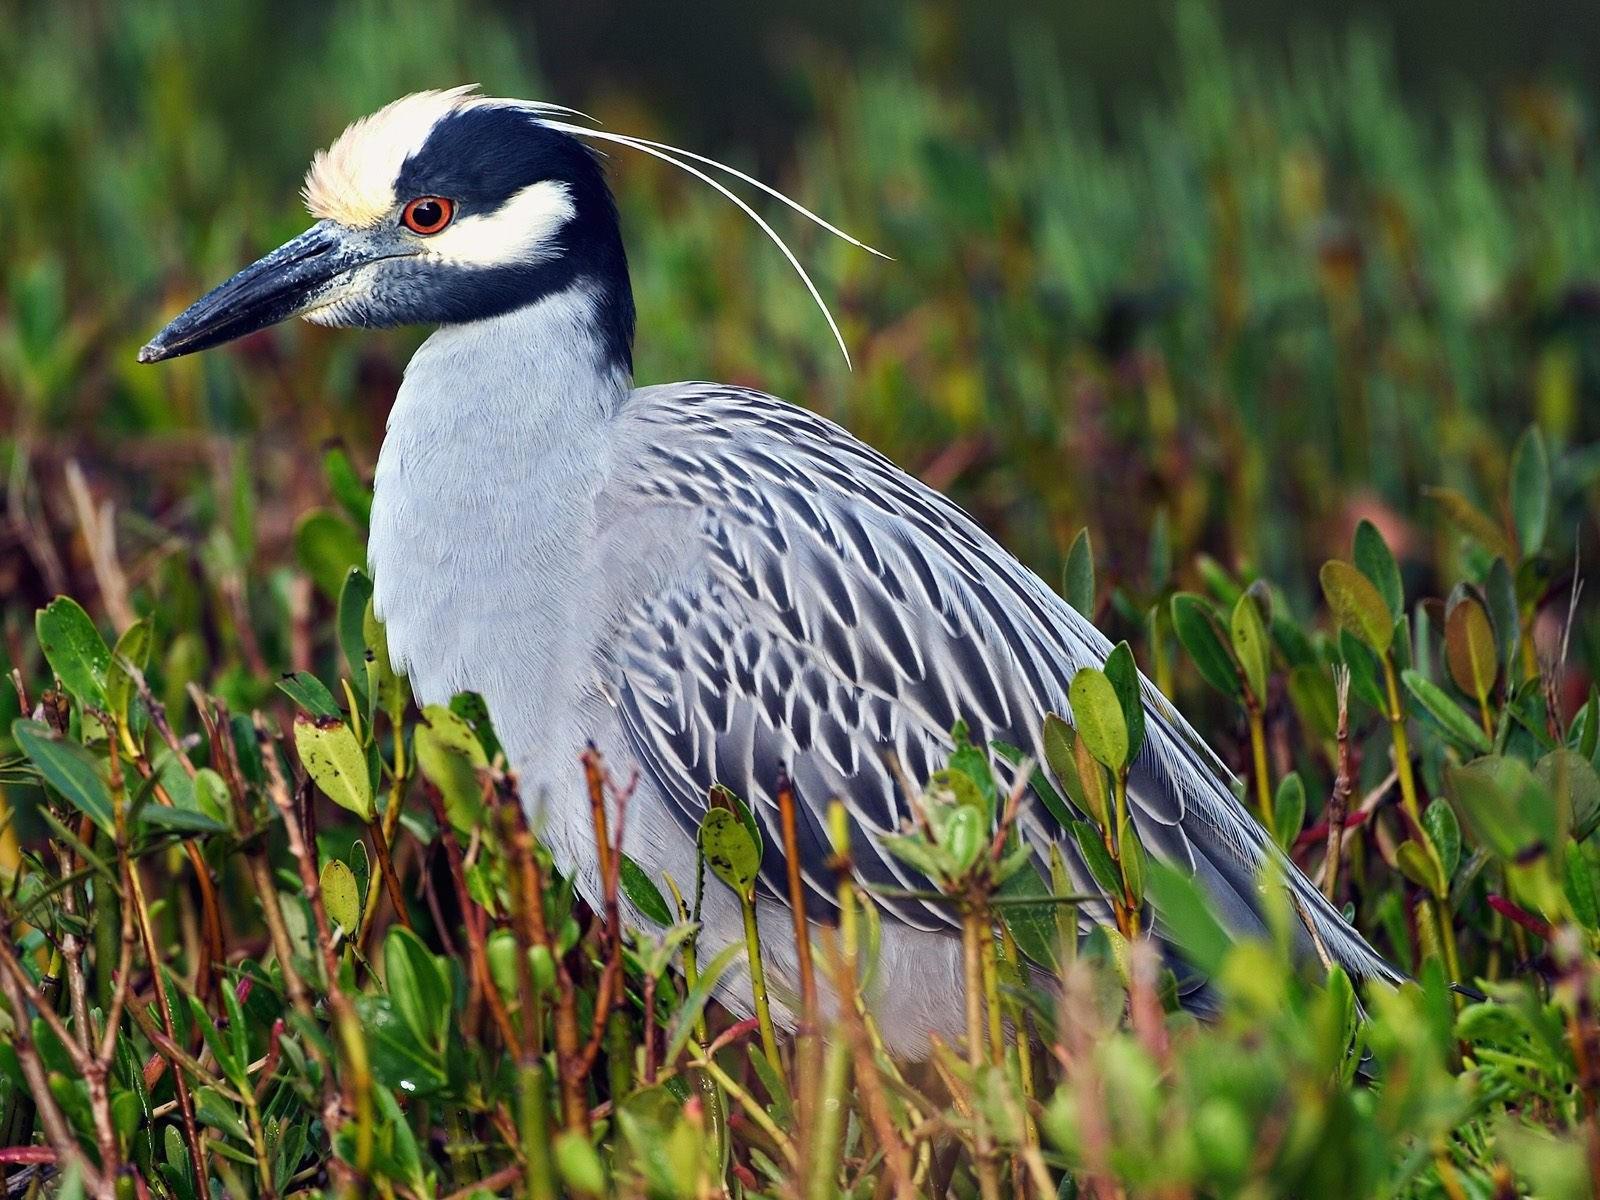 Серая птица в траве